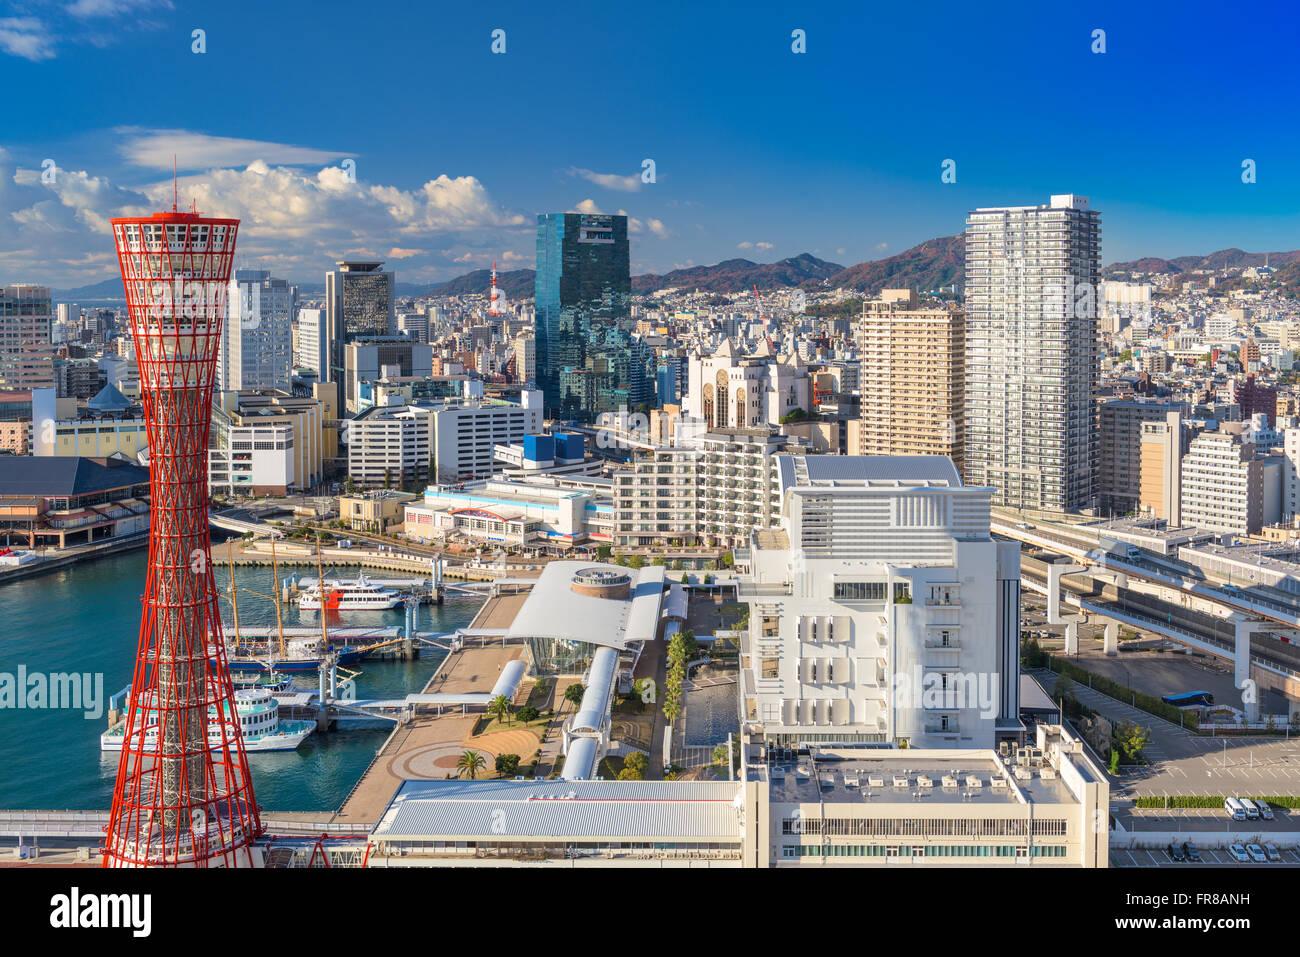 Kobe, Japan harbor skyline. - Stock Image